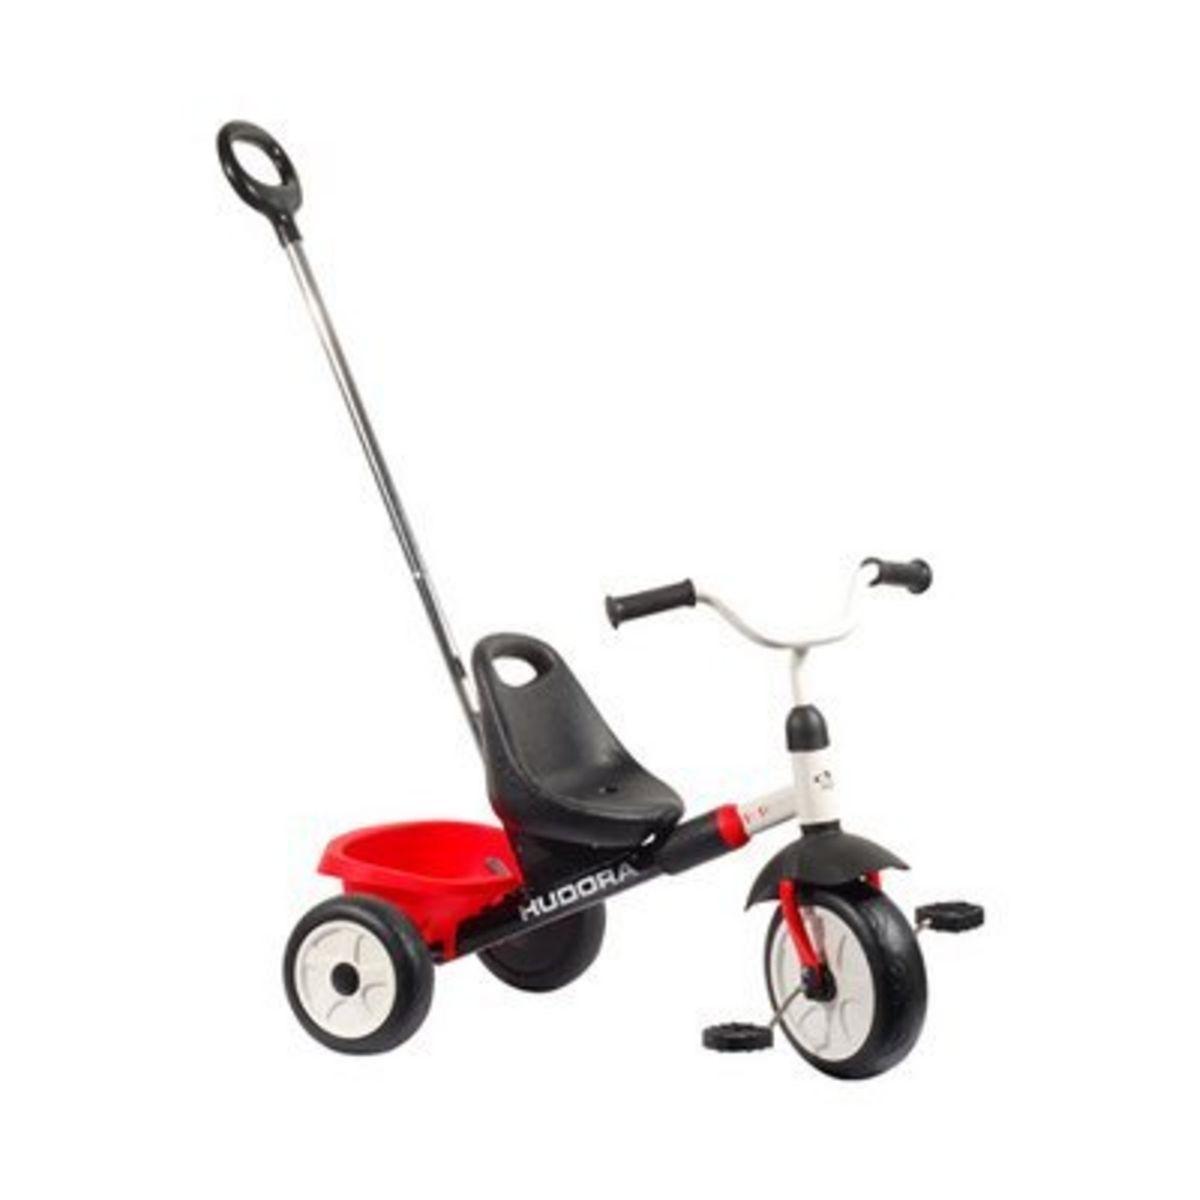 HUDORA Le tricycle One2Run SX 20 véhicule